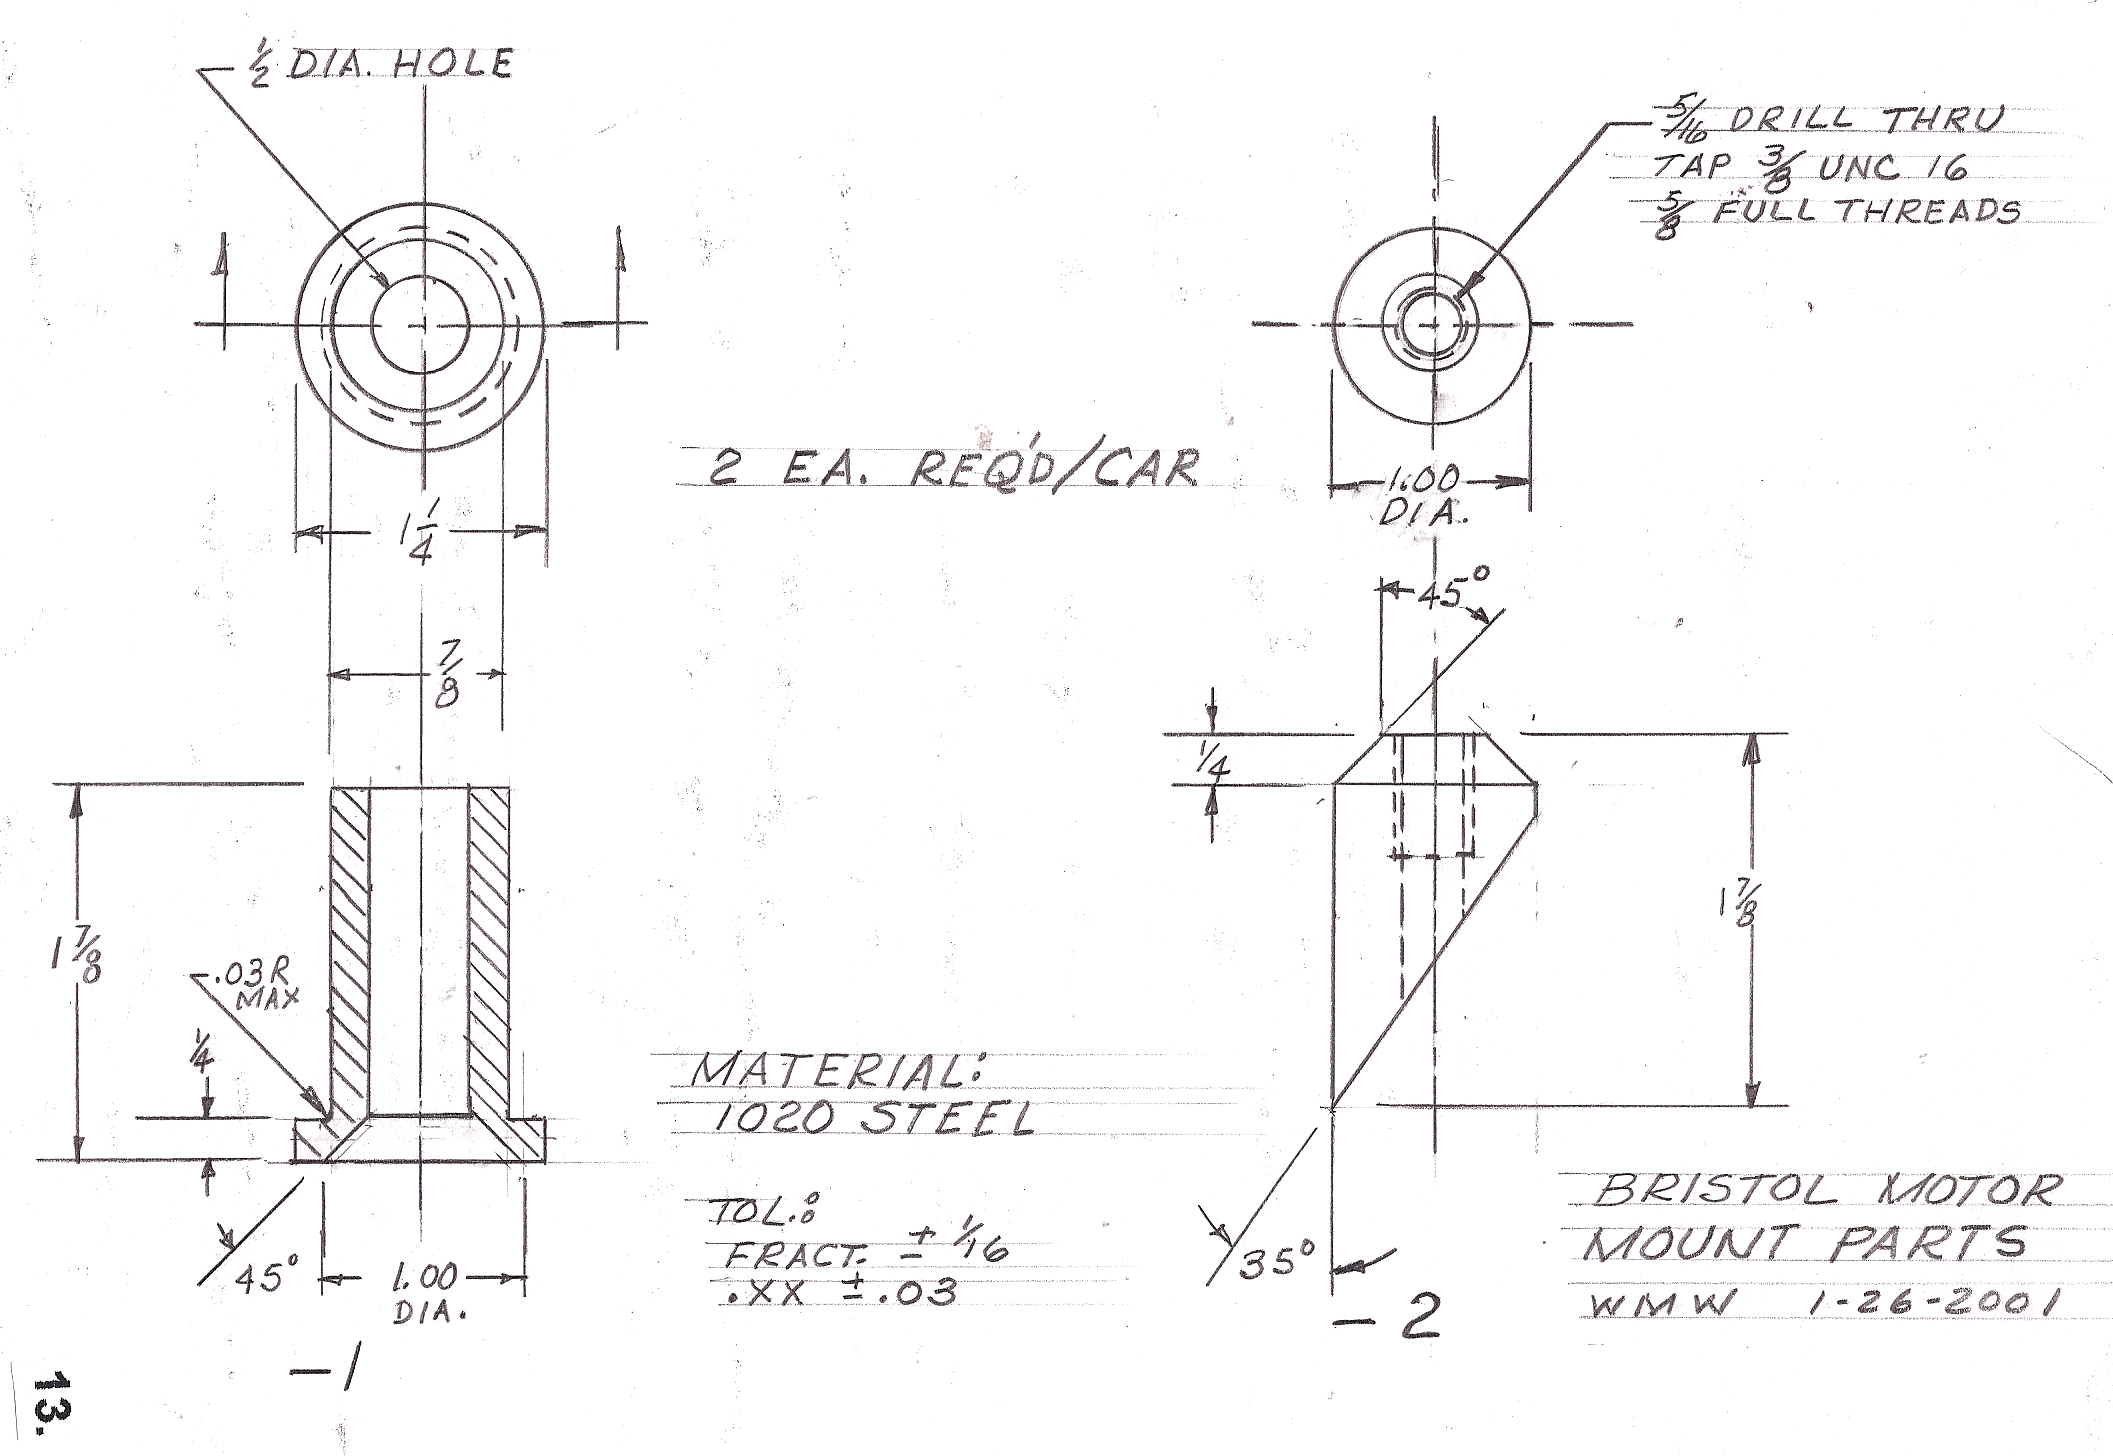 arnolt bristol wiring diagram circuit diagram symbols u2022 rh blogospheree com Arnolt Bristol Coupe Arnolt Bristol Race Car